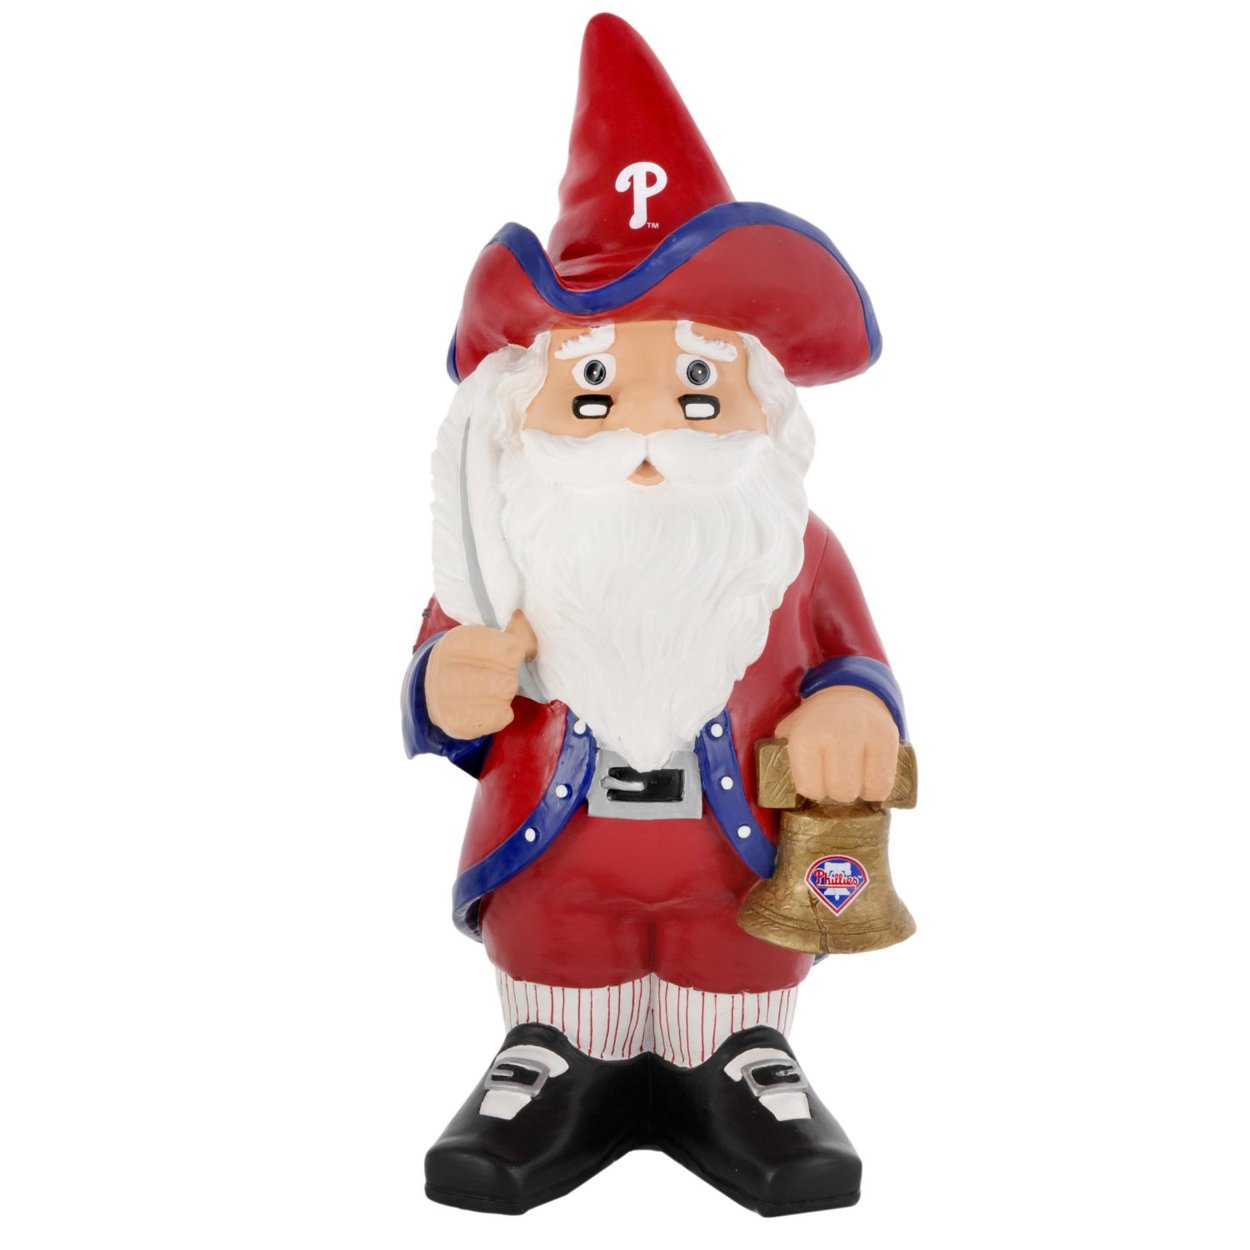 FOCO NCAA Unisex-Adult Team Thematic Gnome